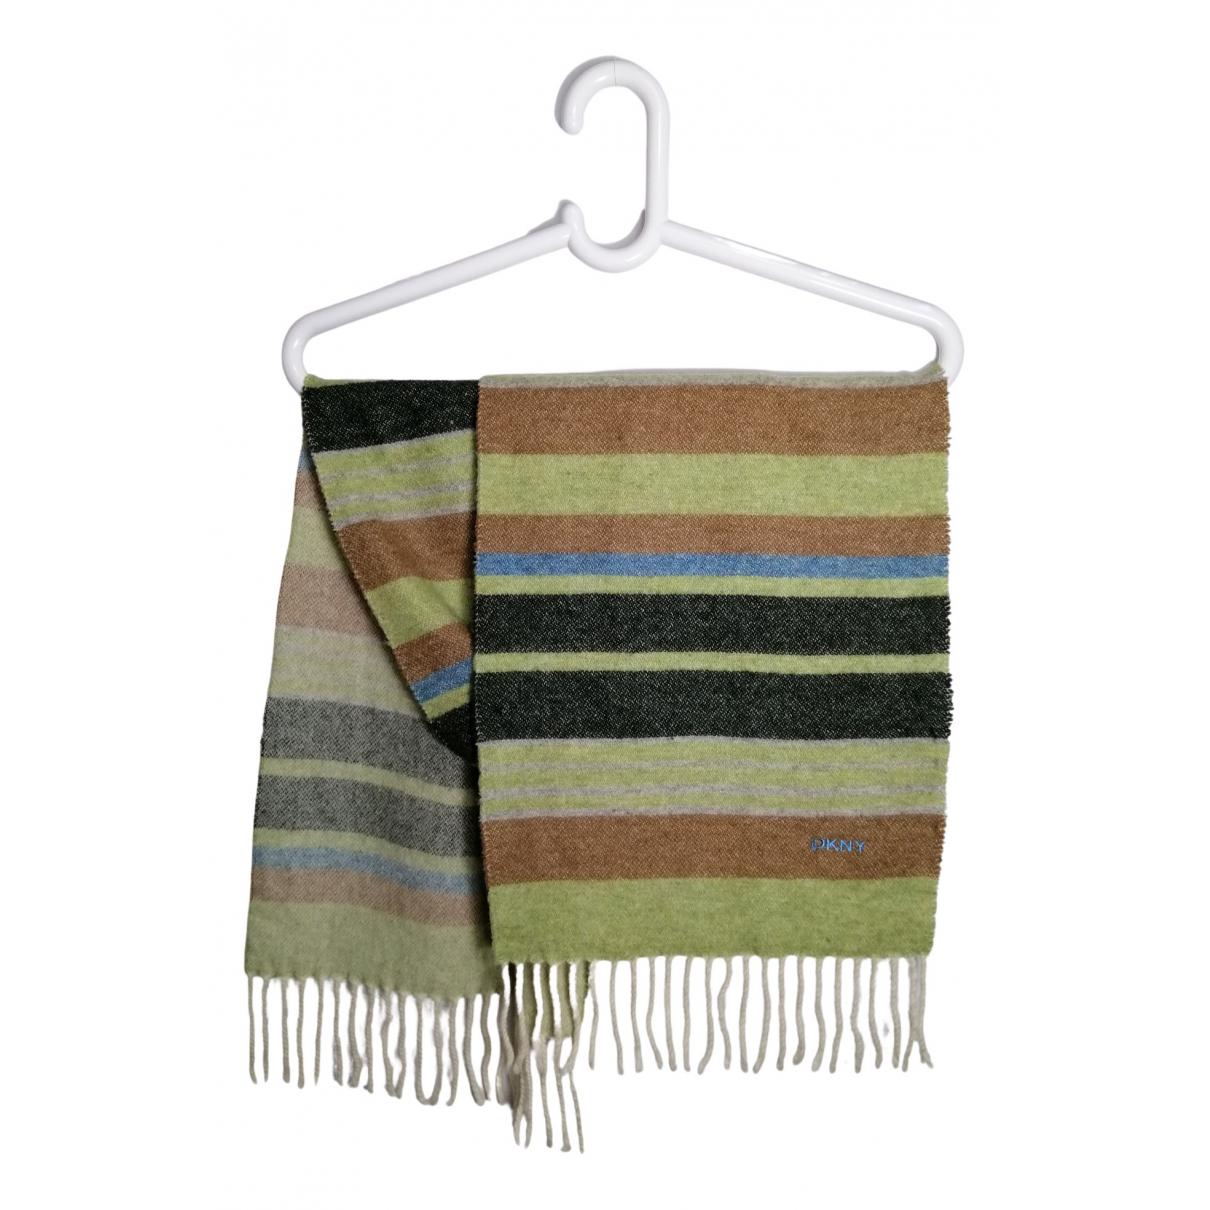 Dkny - Cheches.Echarpes   pour homme en laine - vert